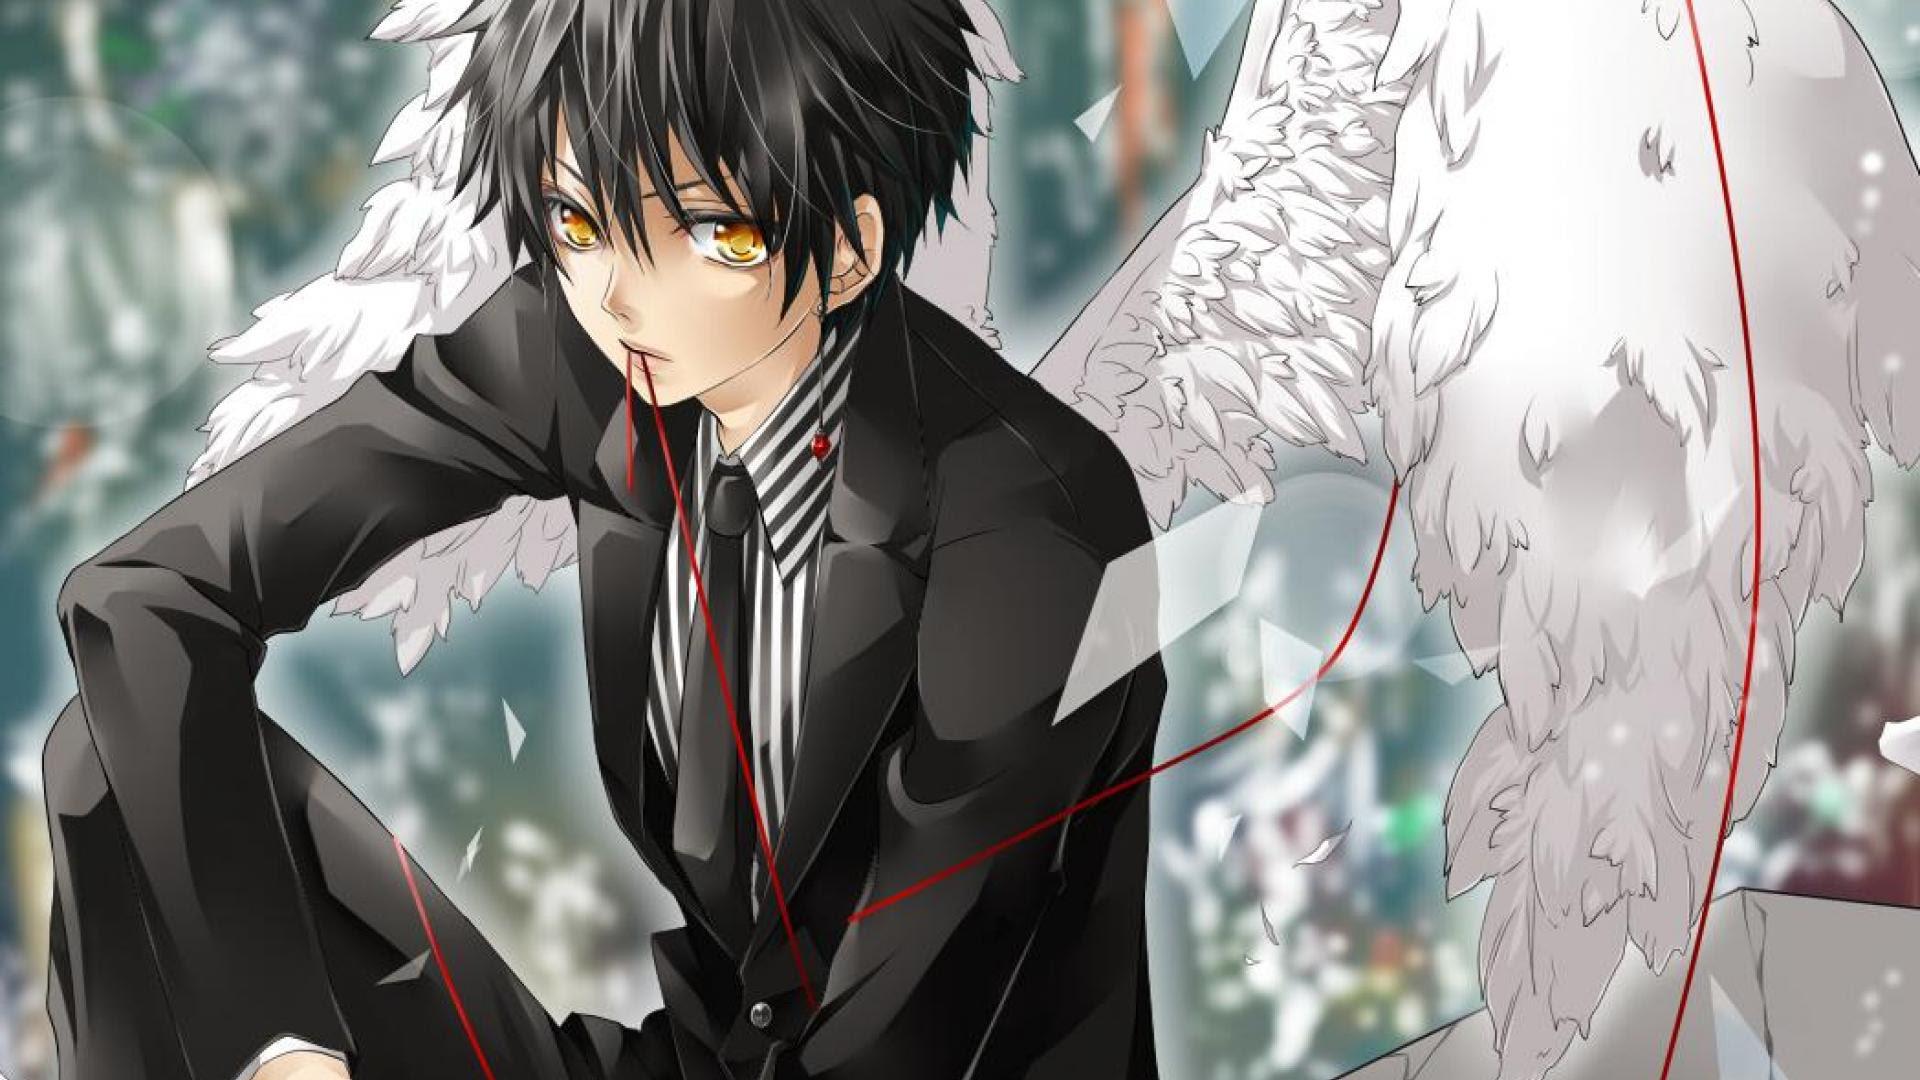 Anime Boy Demon Desktop Wallpaper 22324 - Baltana